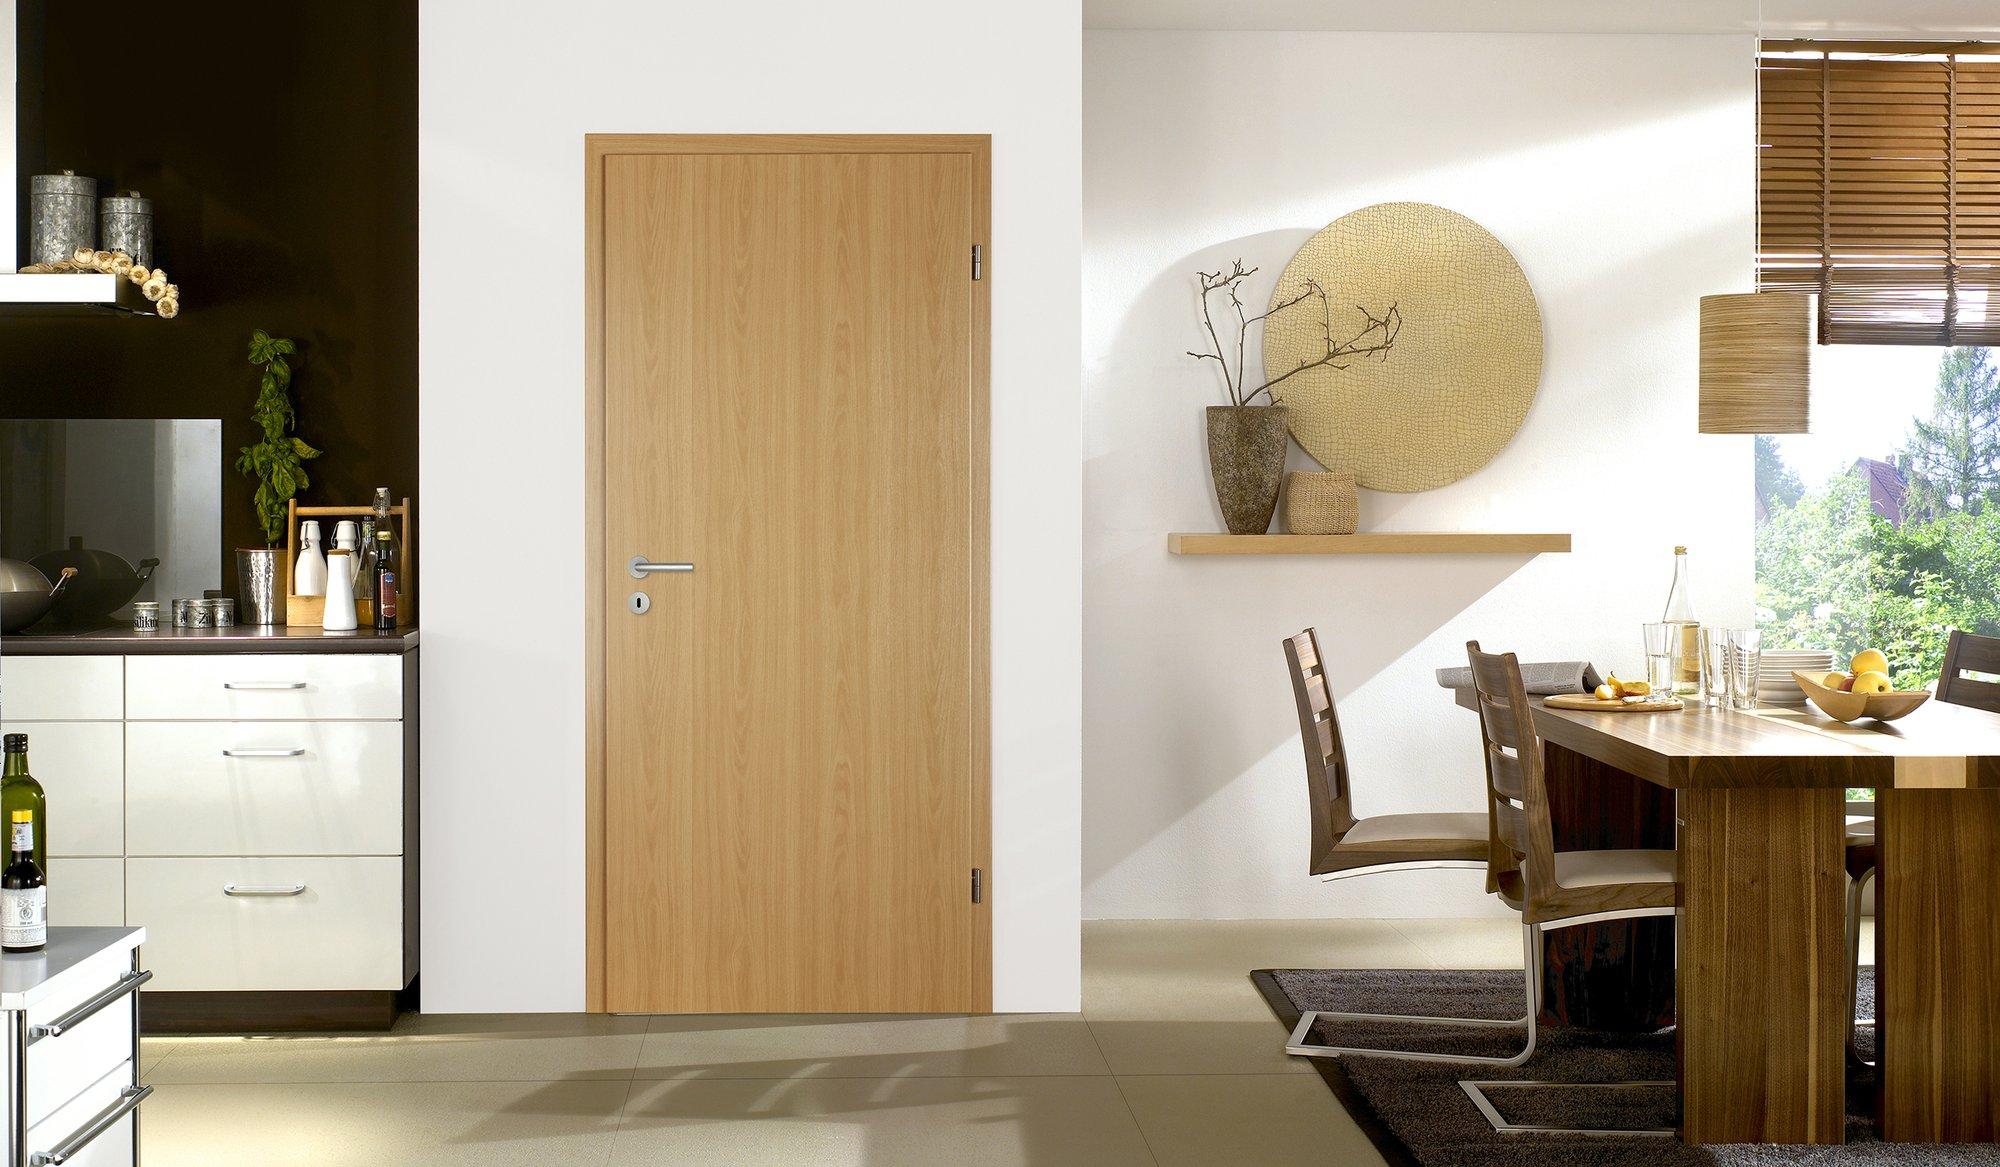 t ren linnenbecker gmbh holzhandel fliesenhandel baustoffhandel. Black Bedroom Furniture Sets. Home Design Ideas